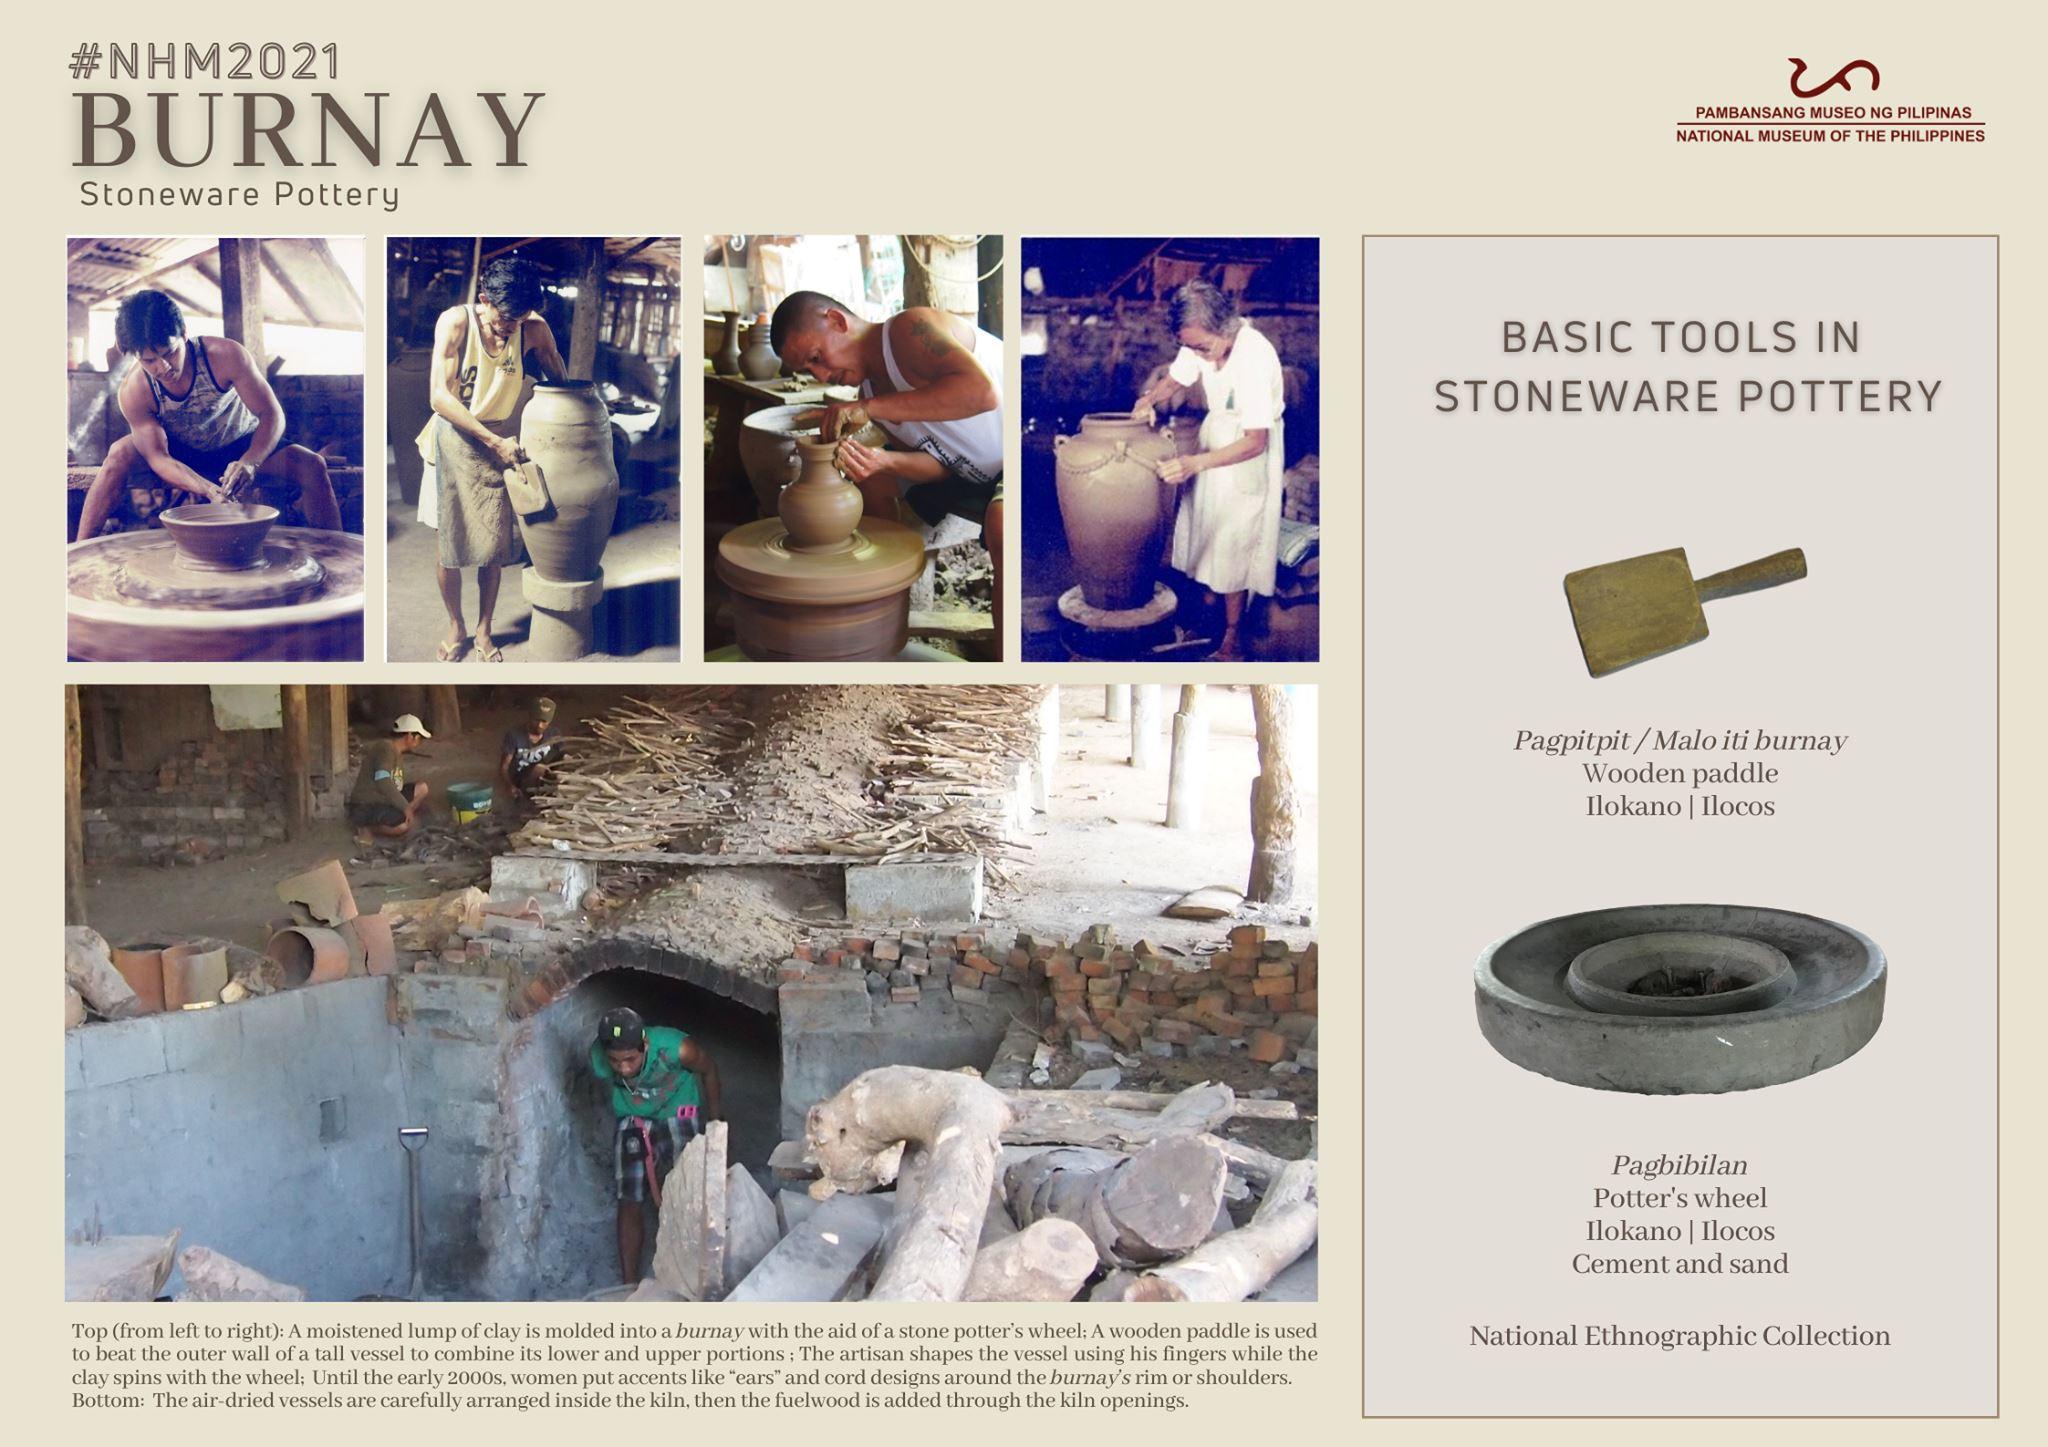 Burnay Burnayan Stoneware pottery